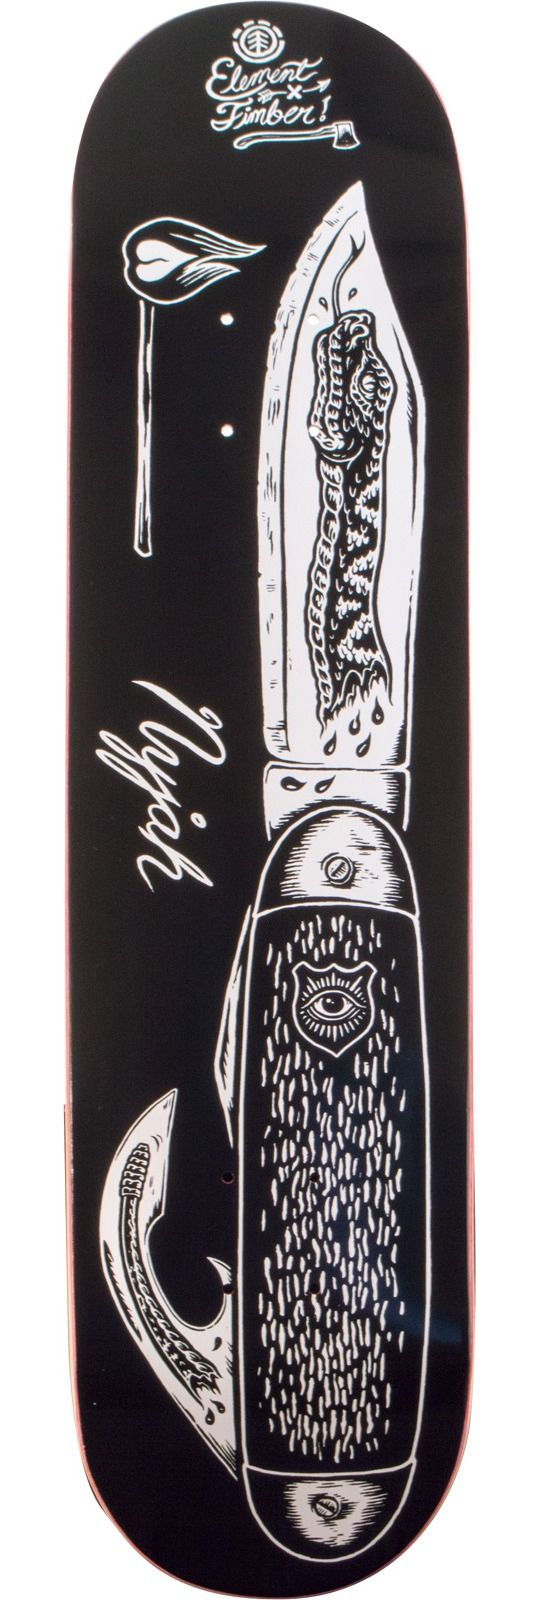 lement Skateboards Nyjah Huston Featherlight Knife Skateboard Deck